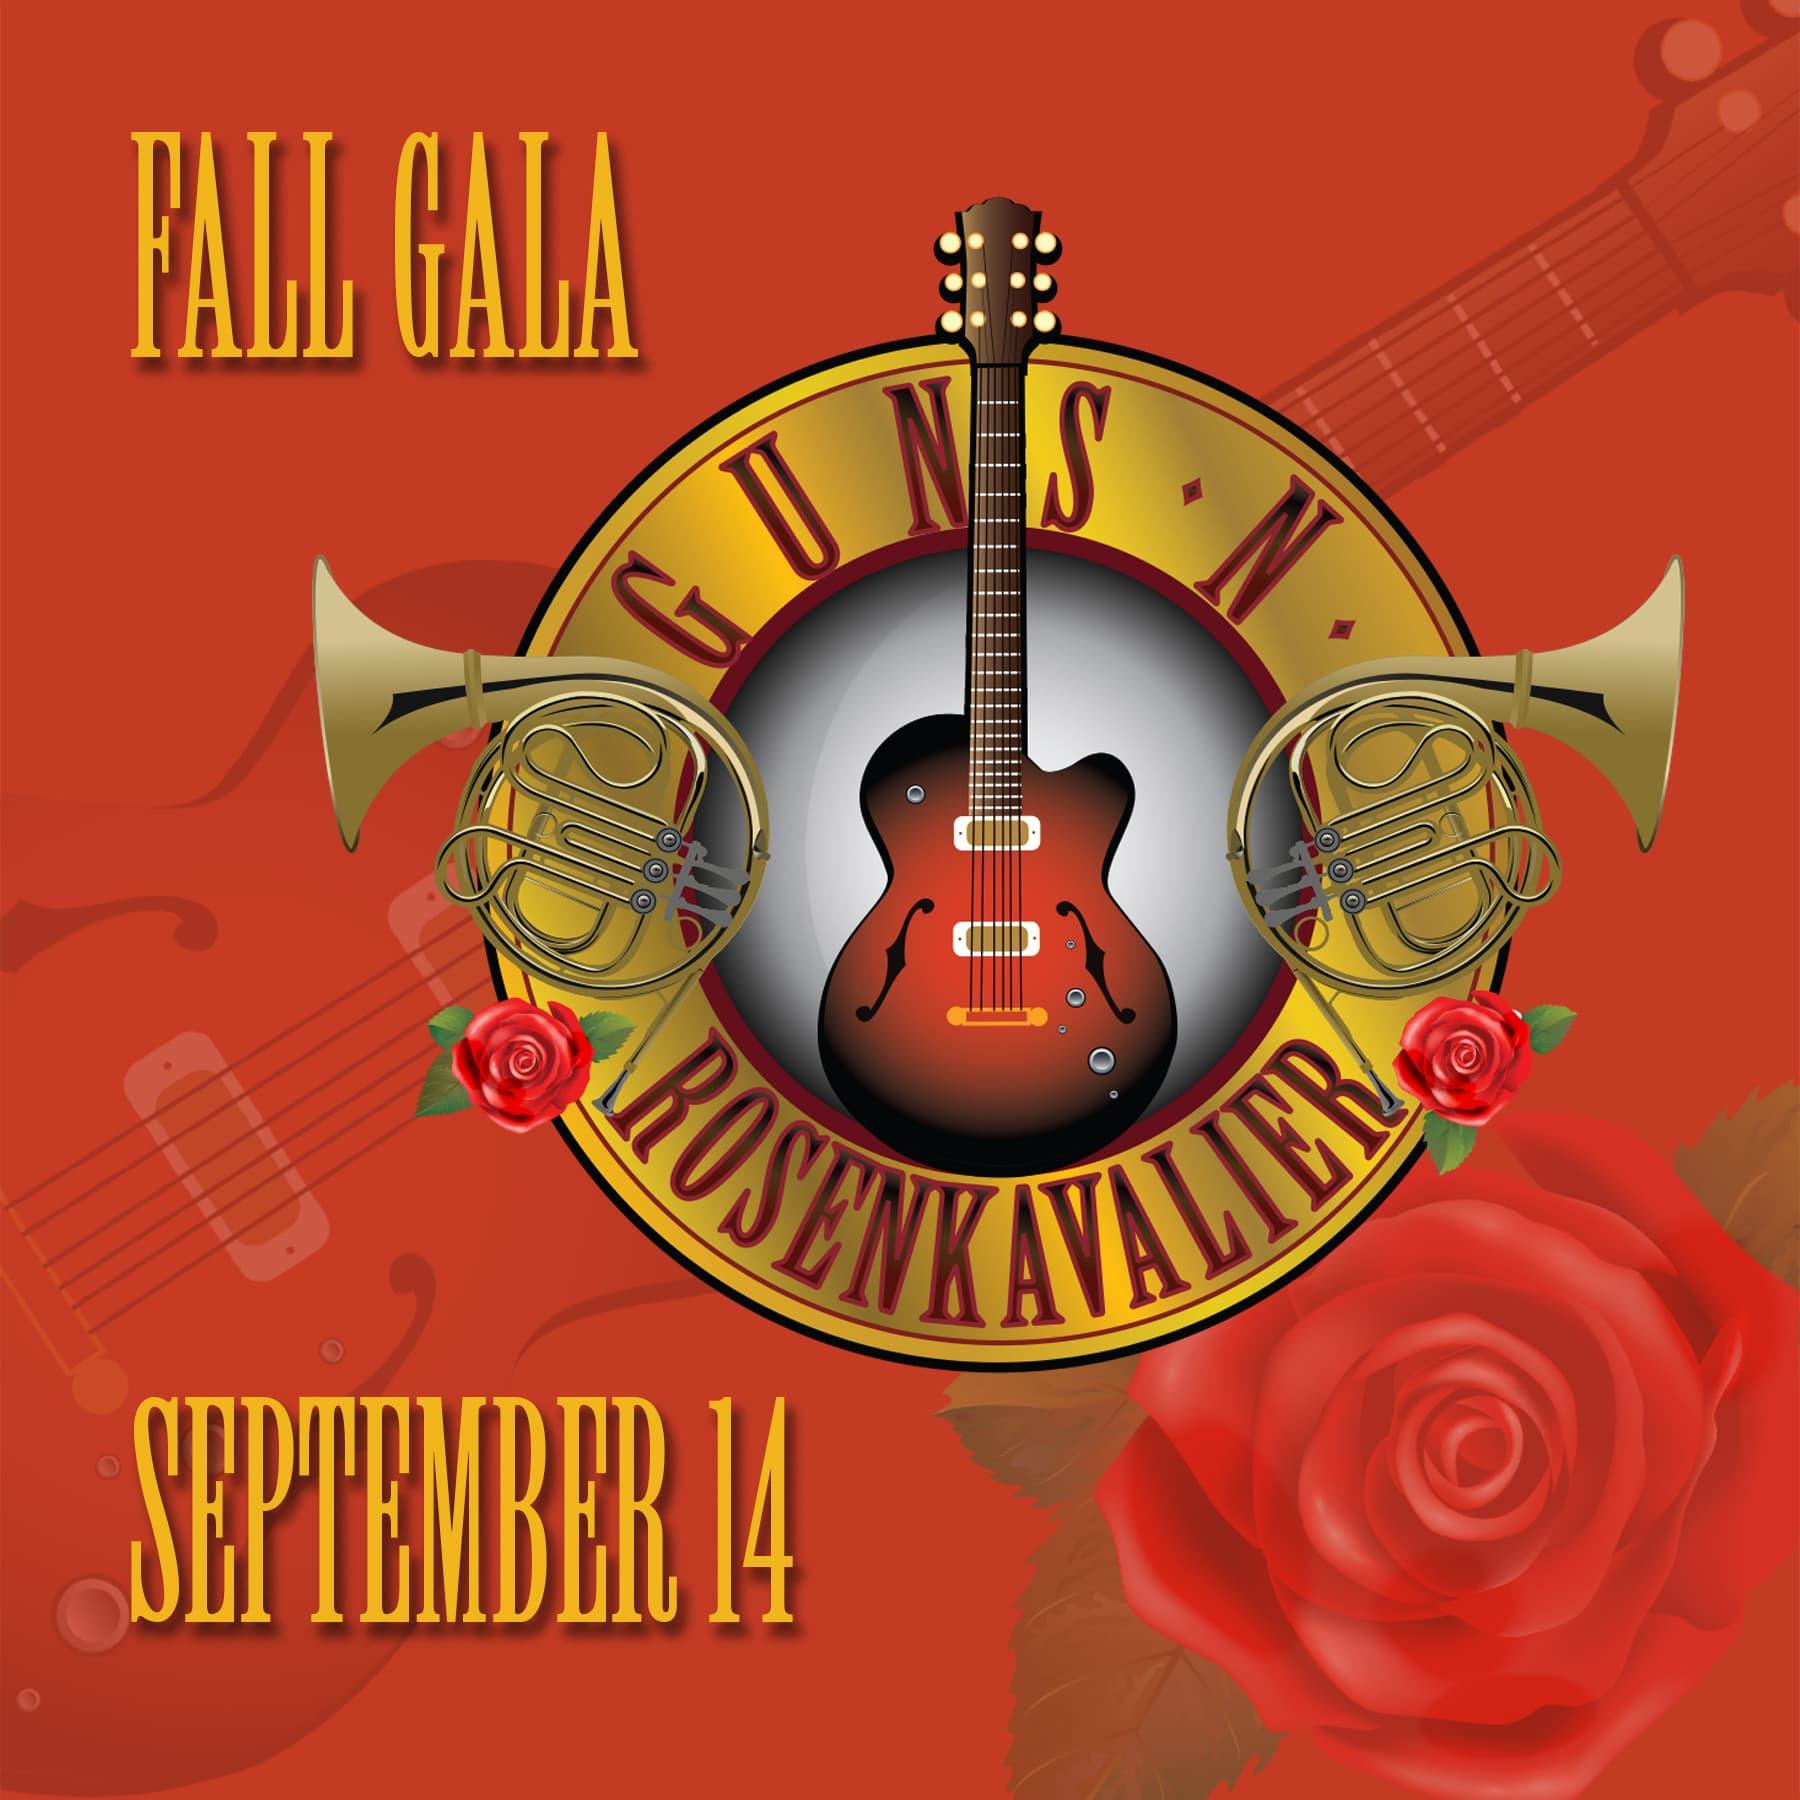 Eugene Opera Fall Gala 2021